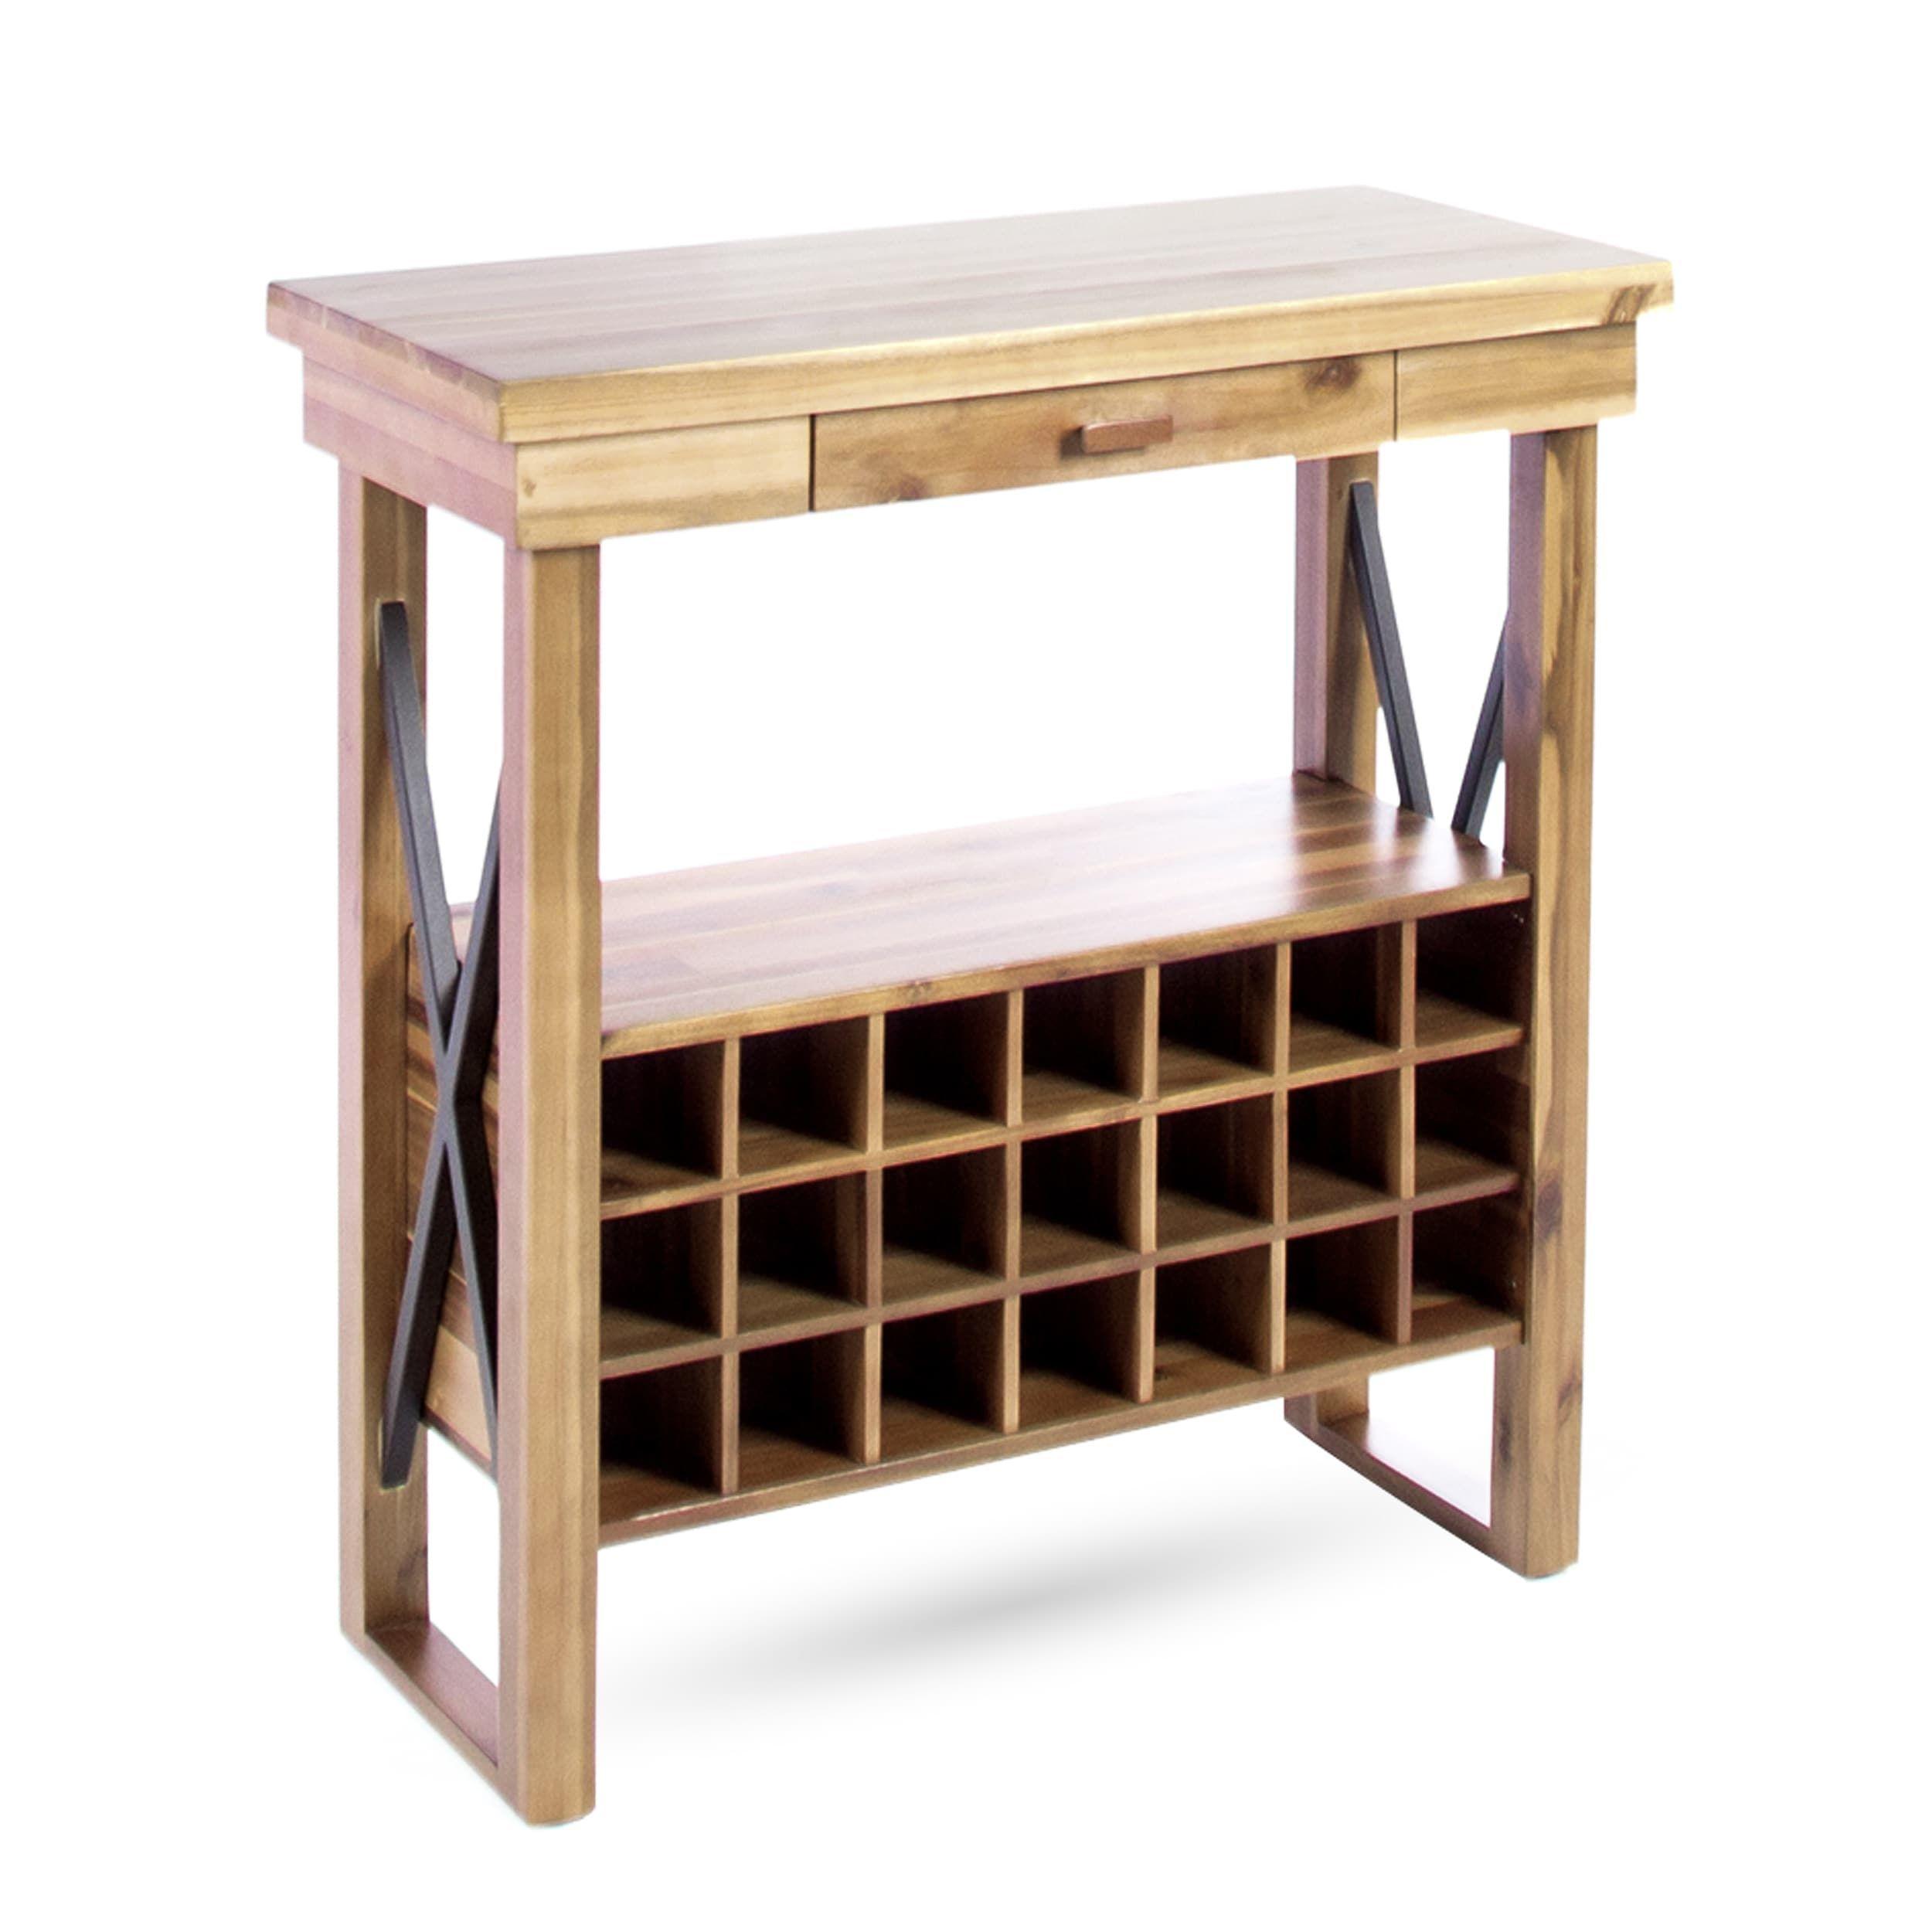 joachim traditional acacia wood wine rack by christopher knight home rh pinterest com